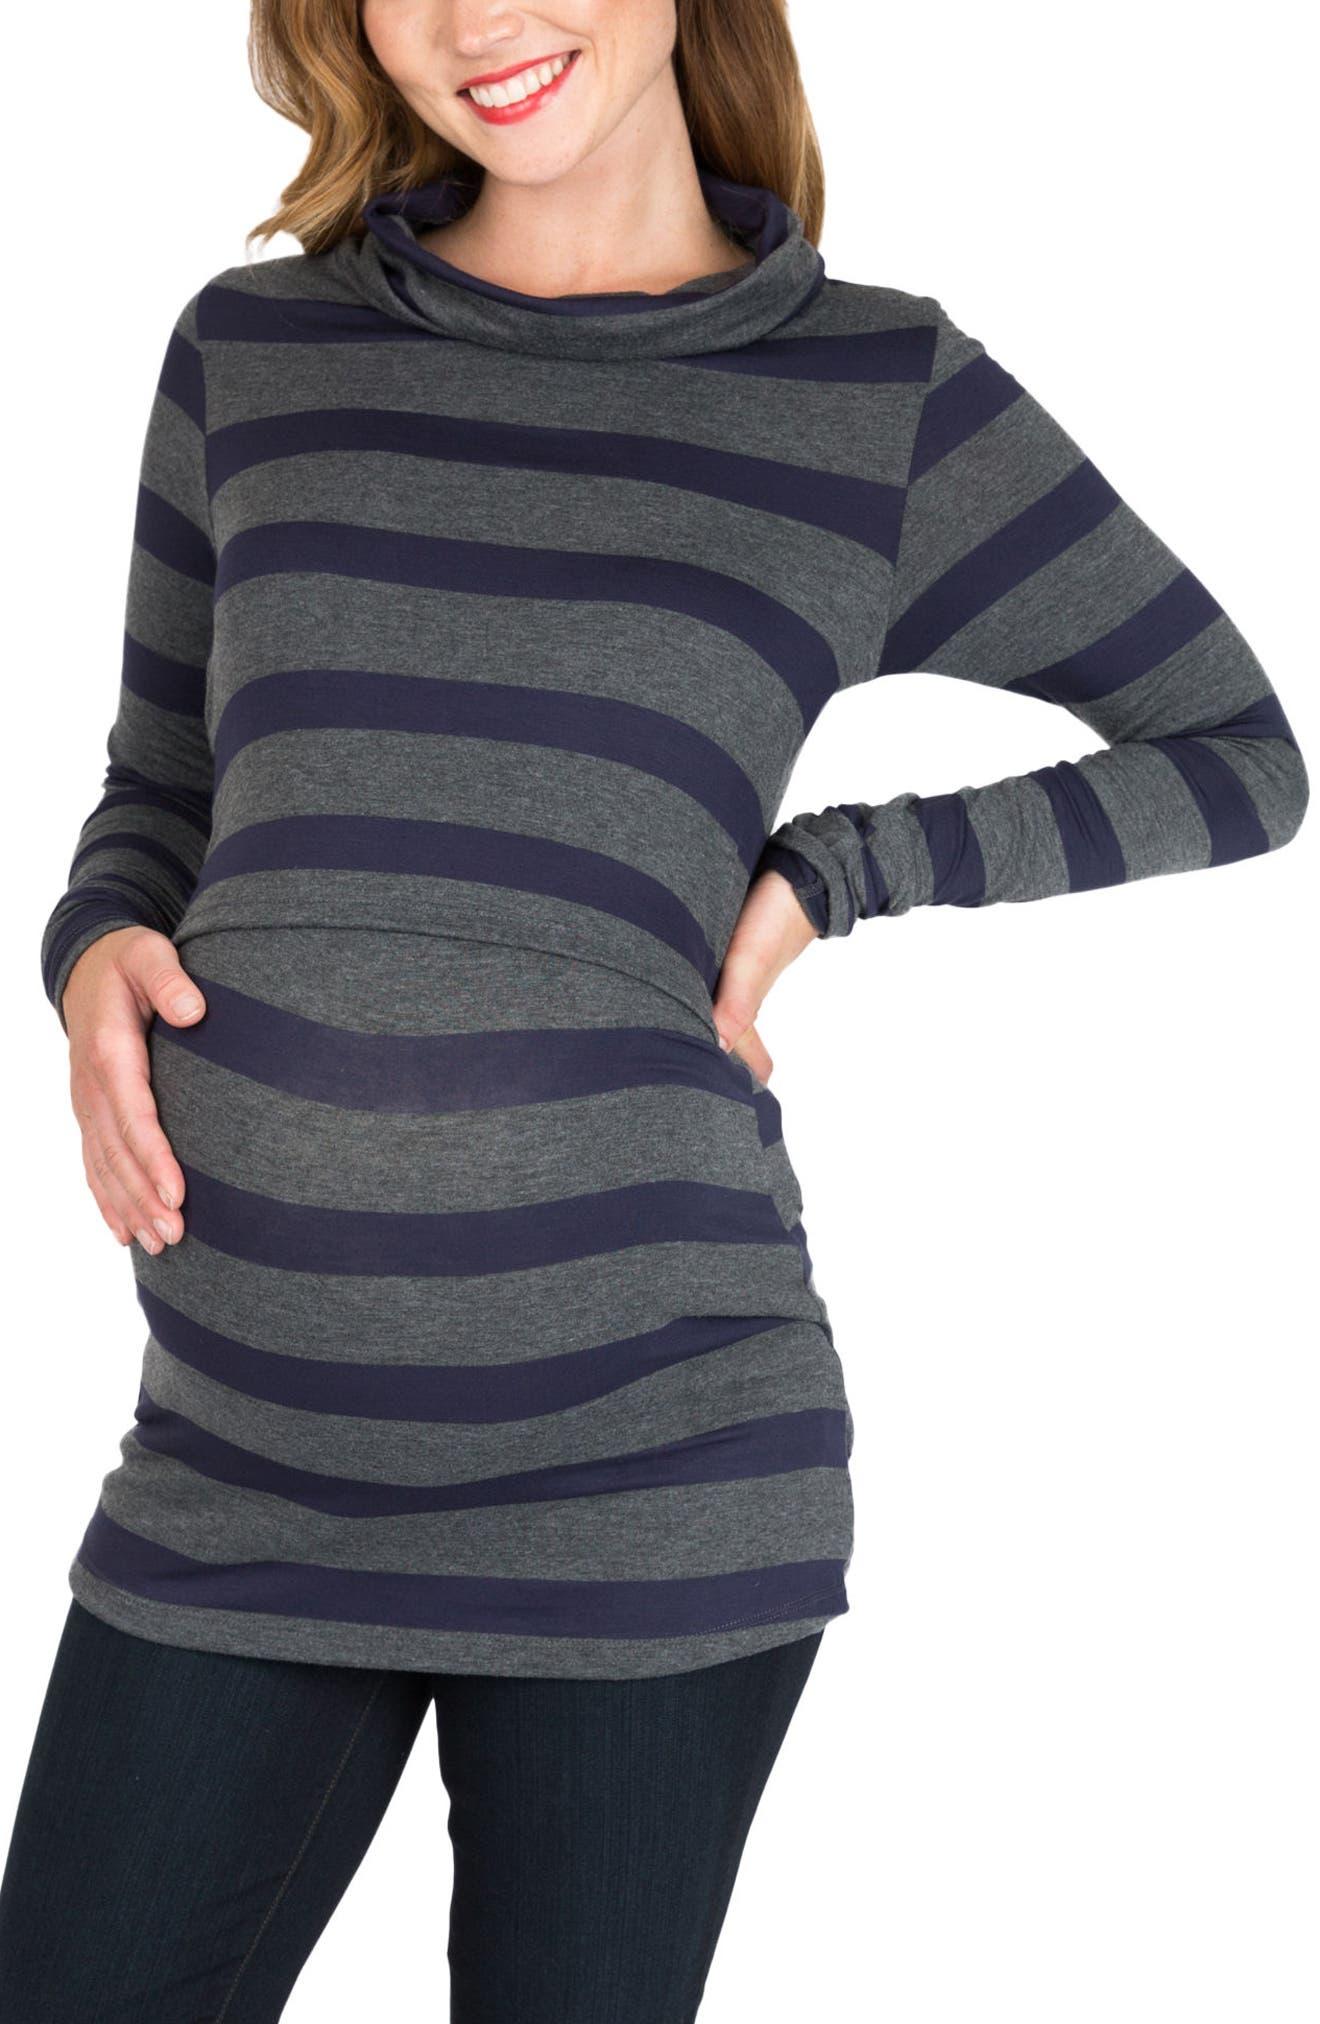 NOM Shelley Maternity/Nursing Turtleneck Tunic,                         Main,                         color, CHARCOAL NAVY